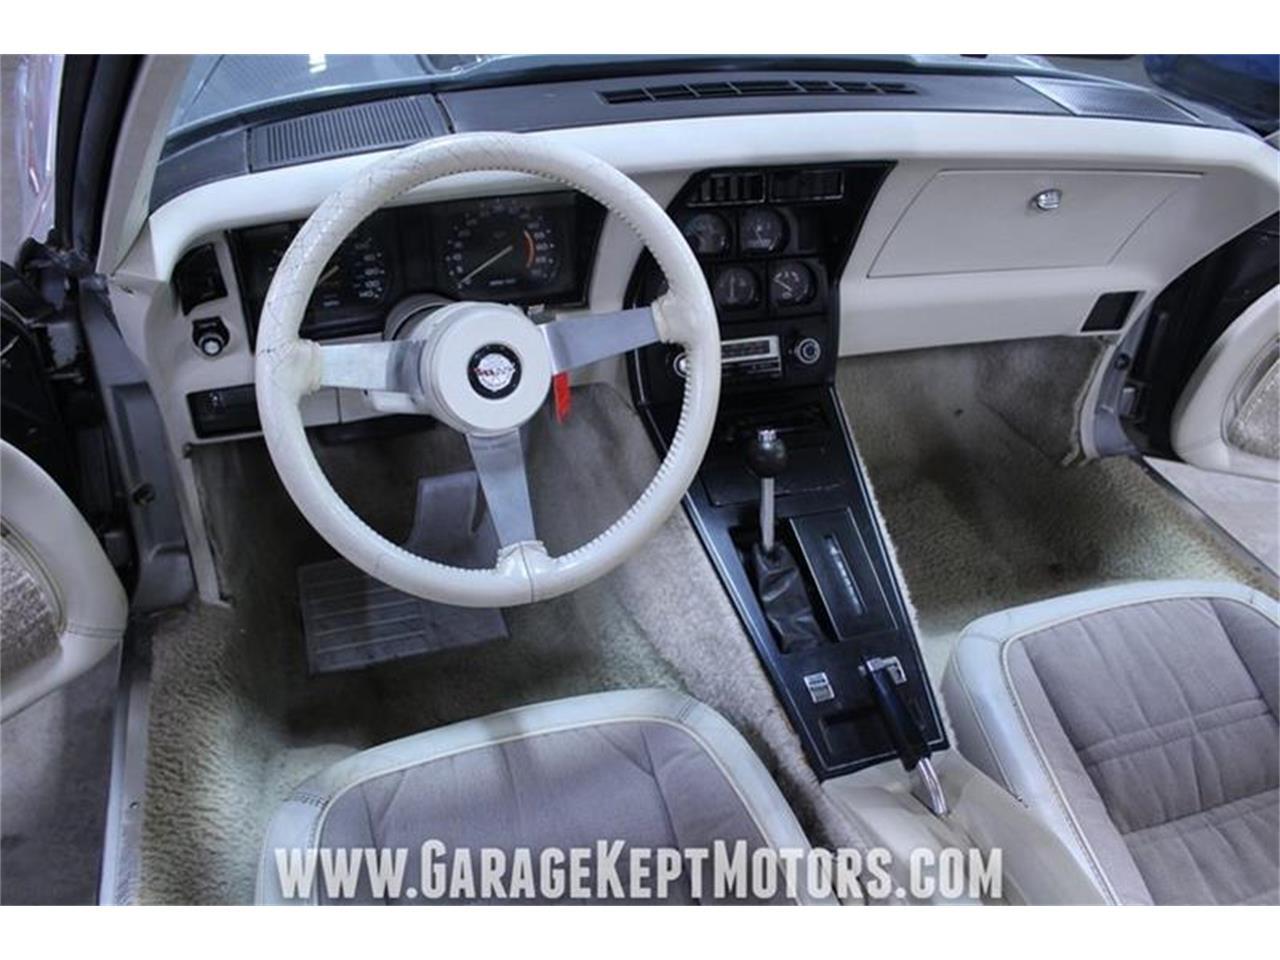 Large Picture of '78 Corvette located in Michigan - $10,900.00 - PWXN